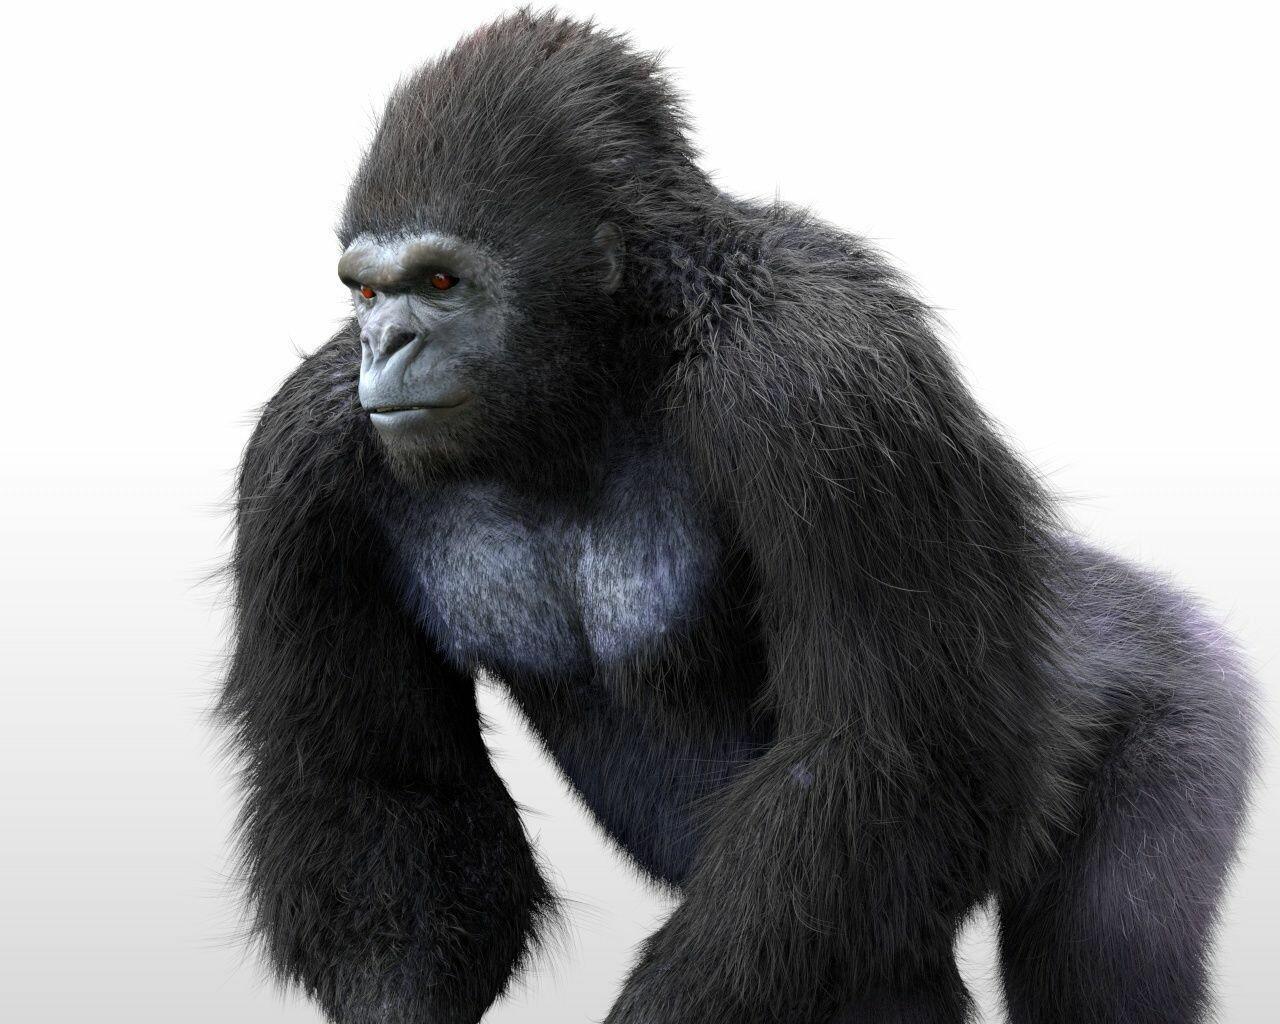 ArtStation - Gorilla 3d model, Mahi Singh